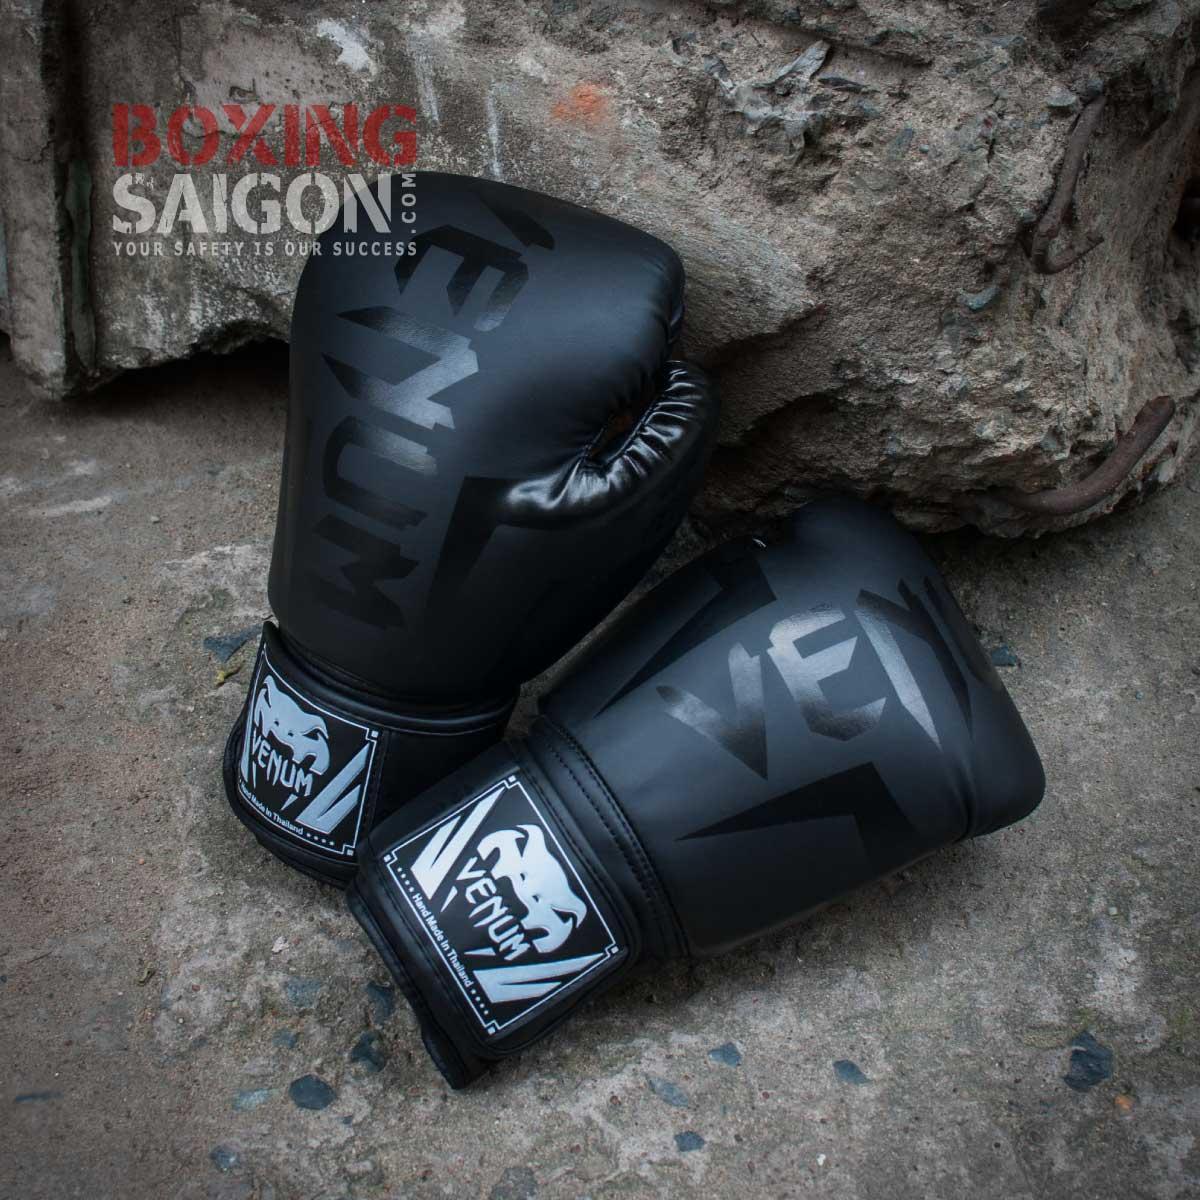 Găng tay Boxing Venum Elite - Đen